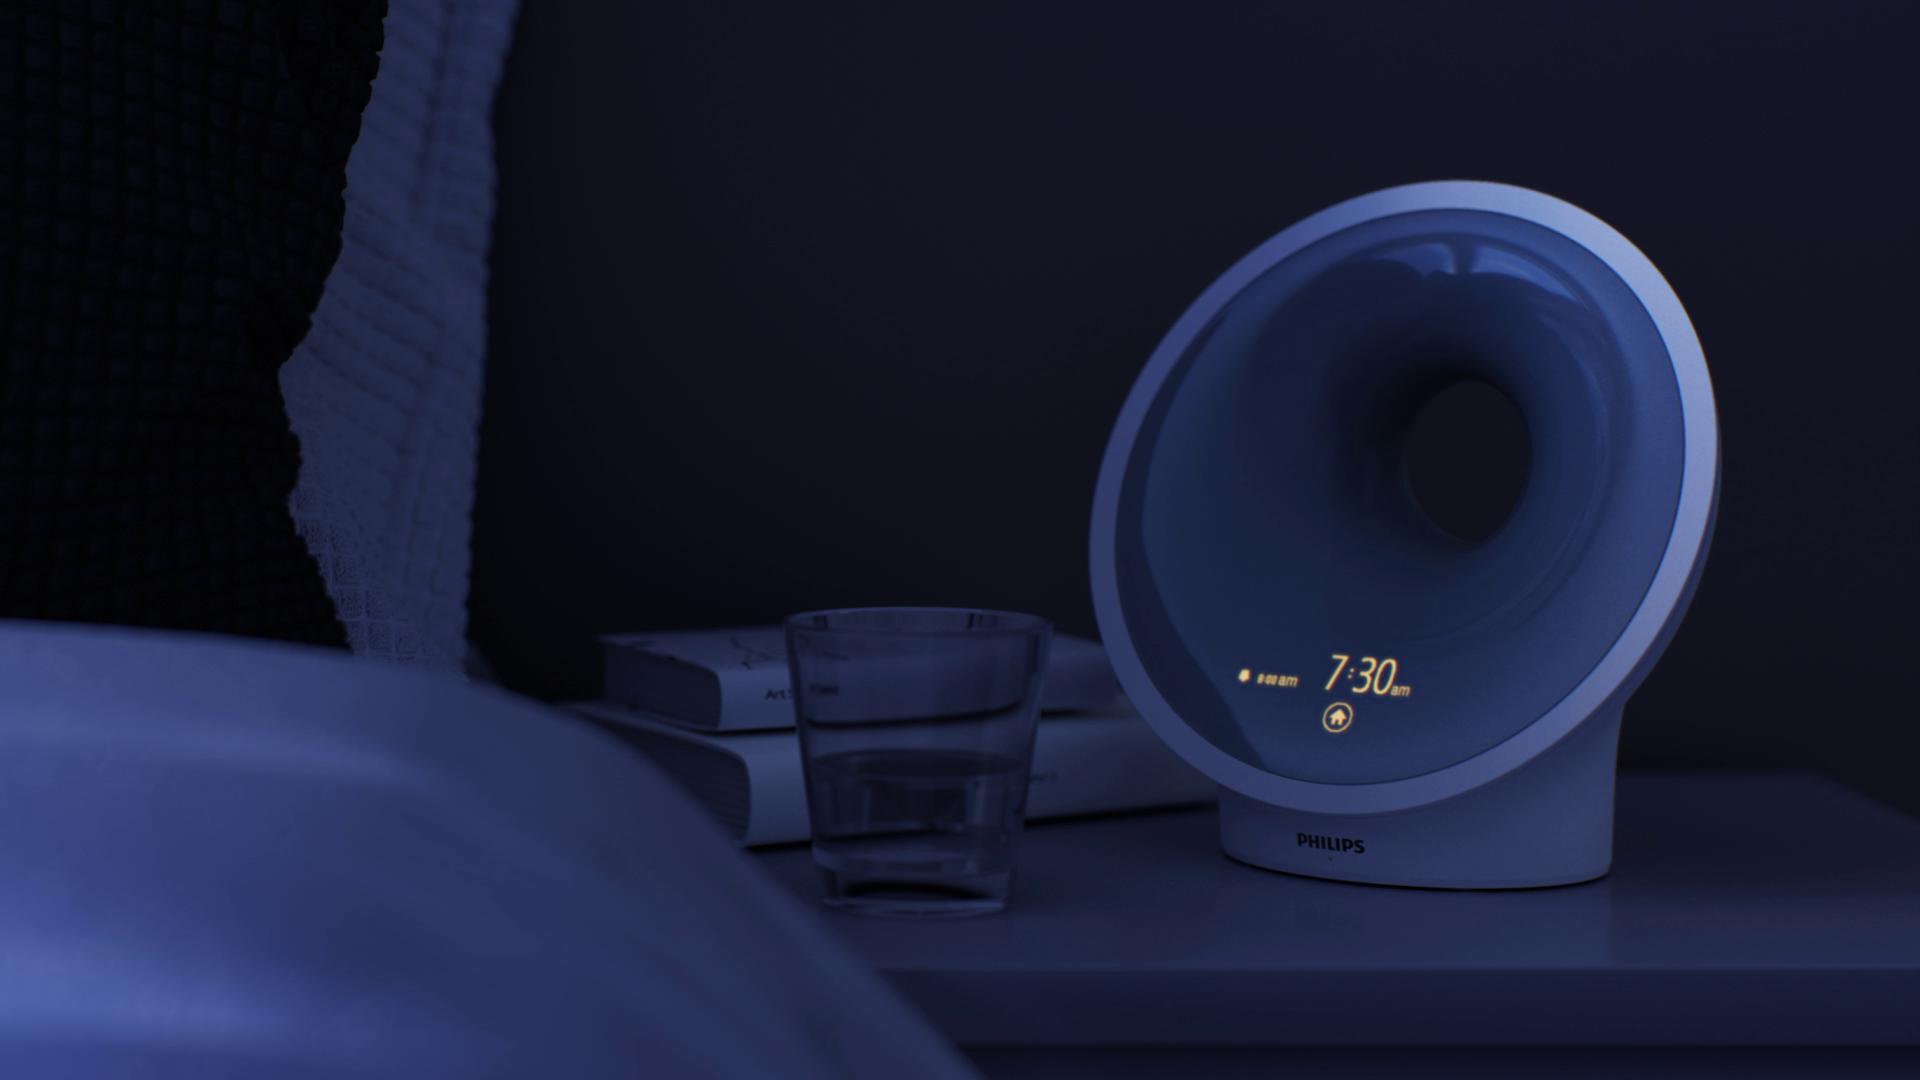 Philips Wake-up Light HF3651/01 Despertador Natural, múltiples ...